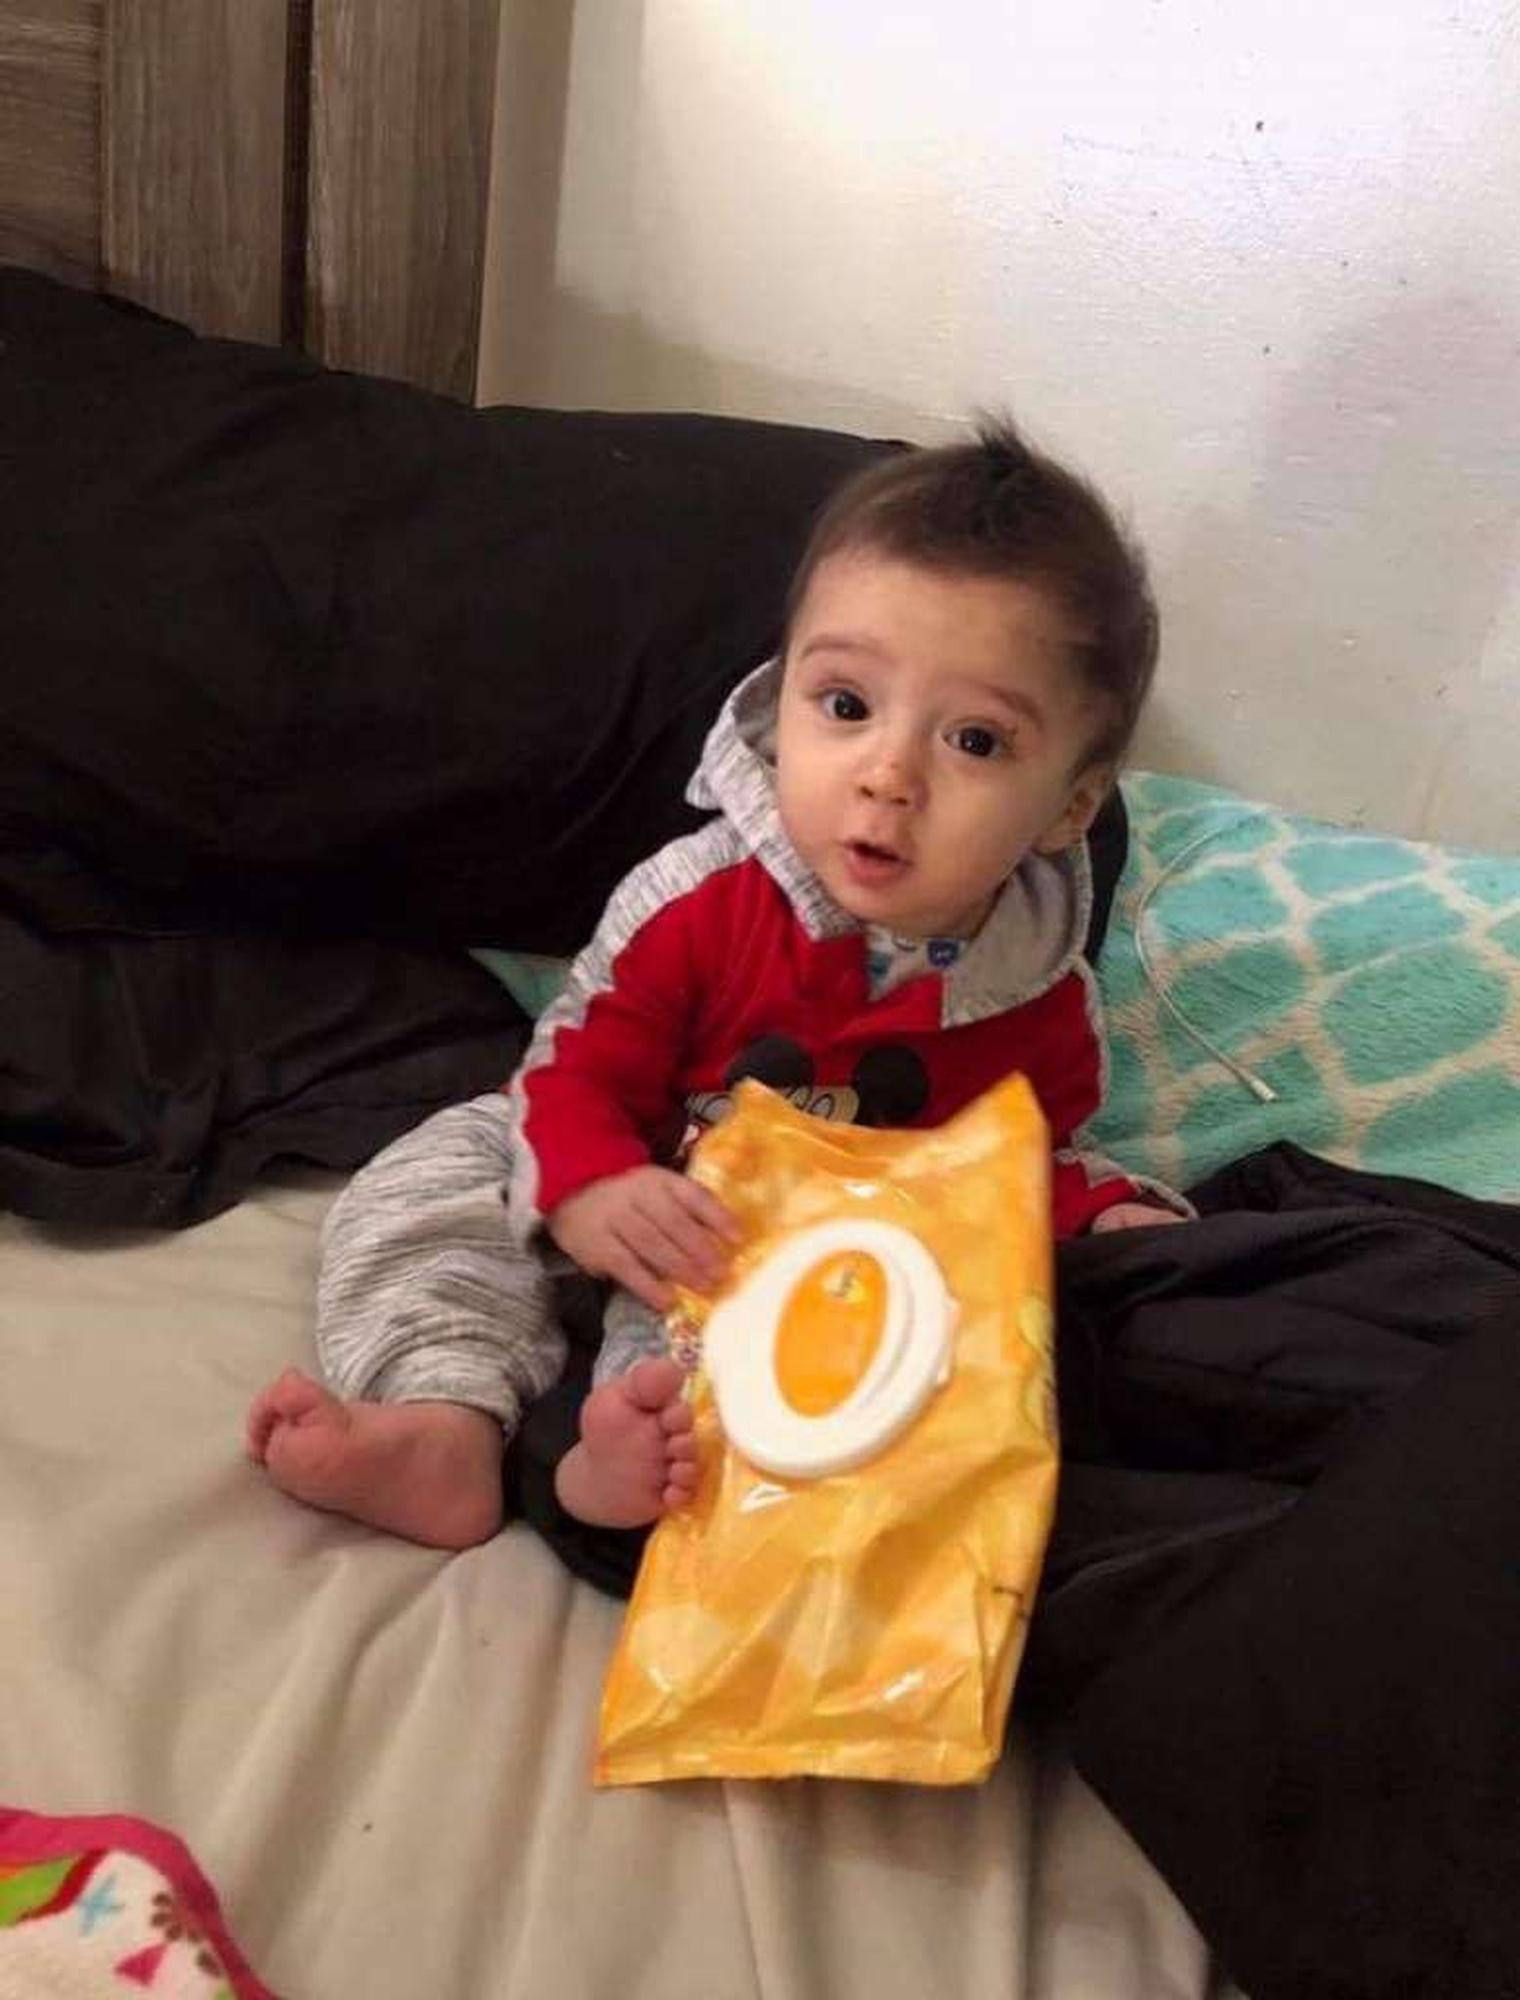 Judge orders CPS to return King Jay's siblings to maternal